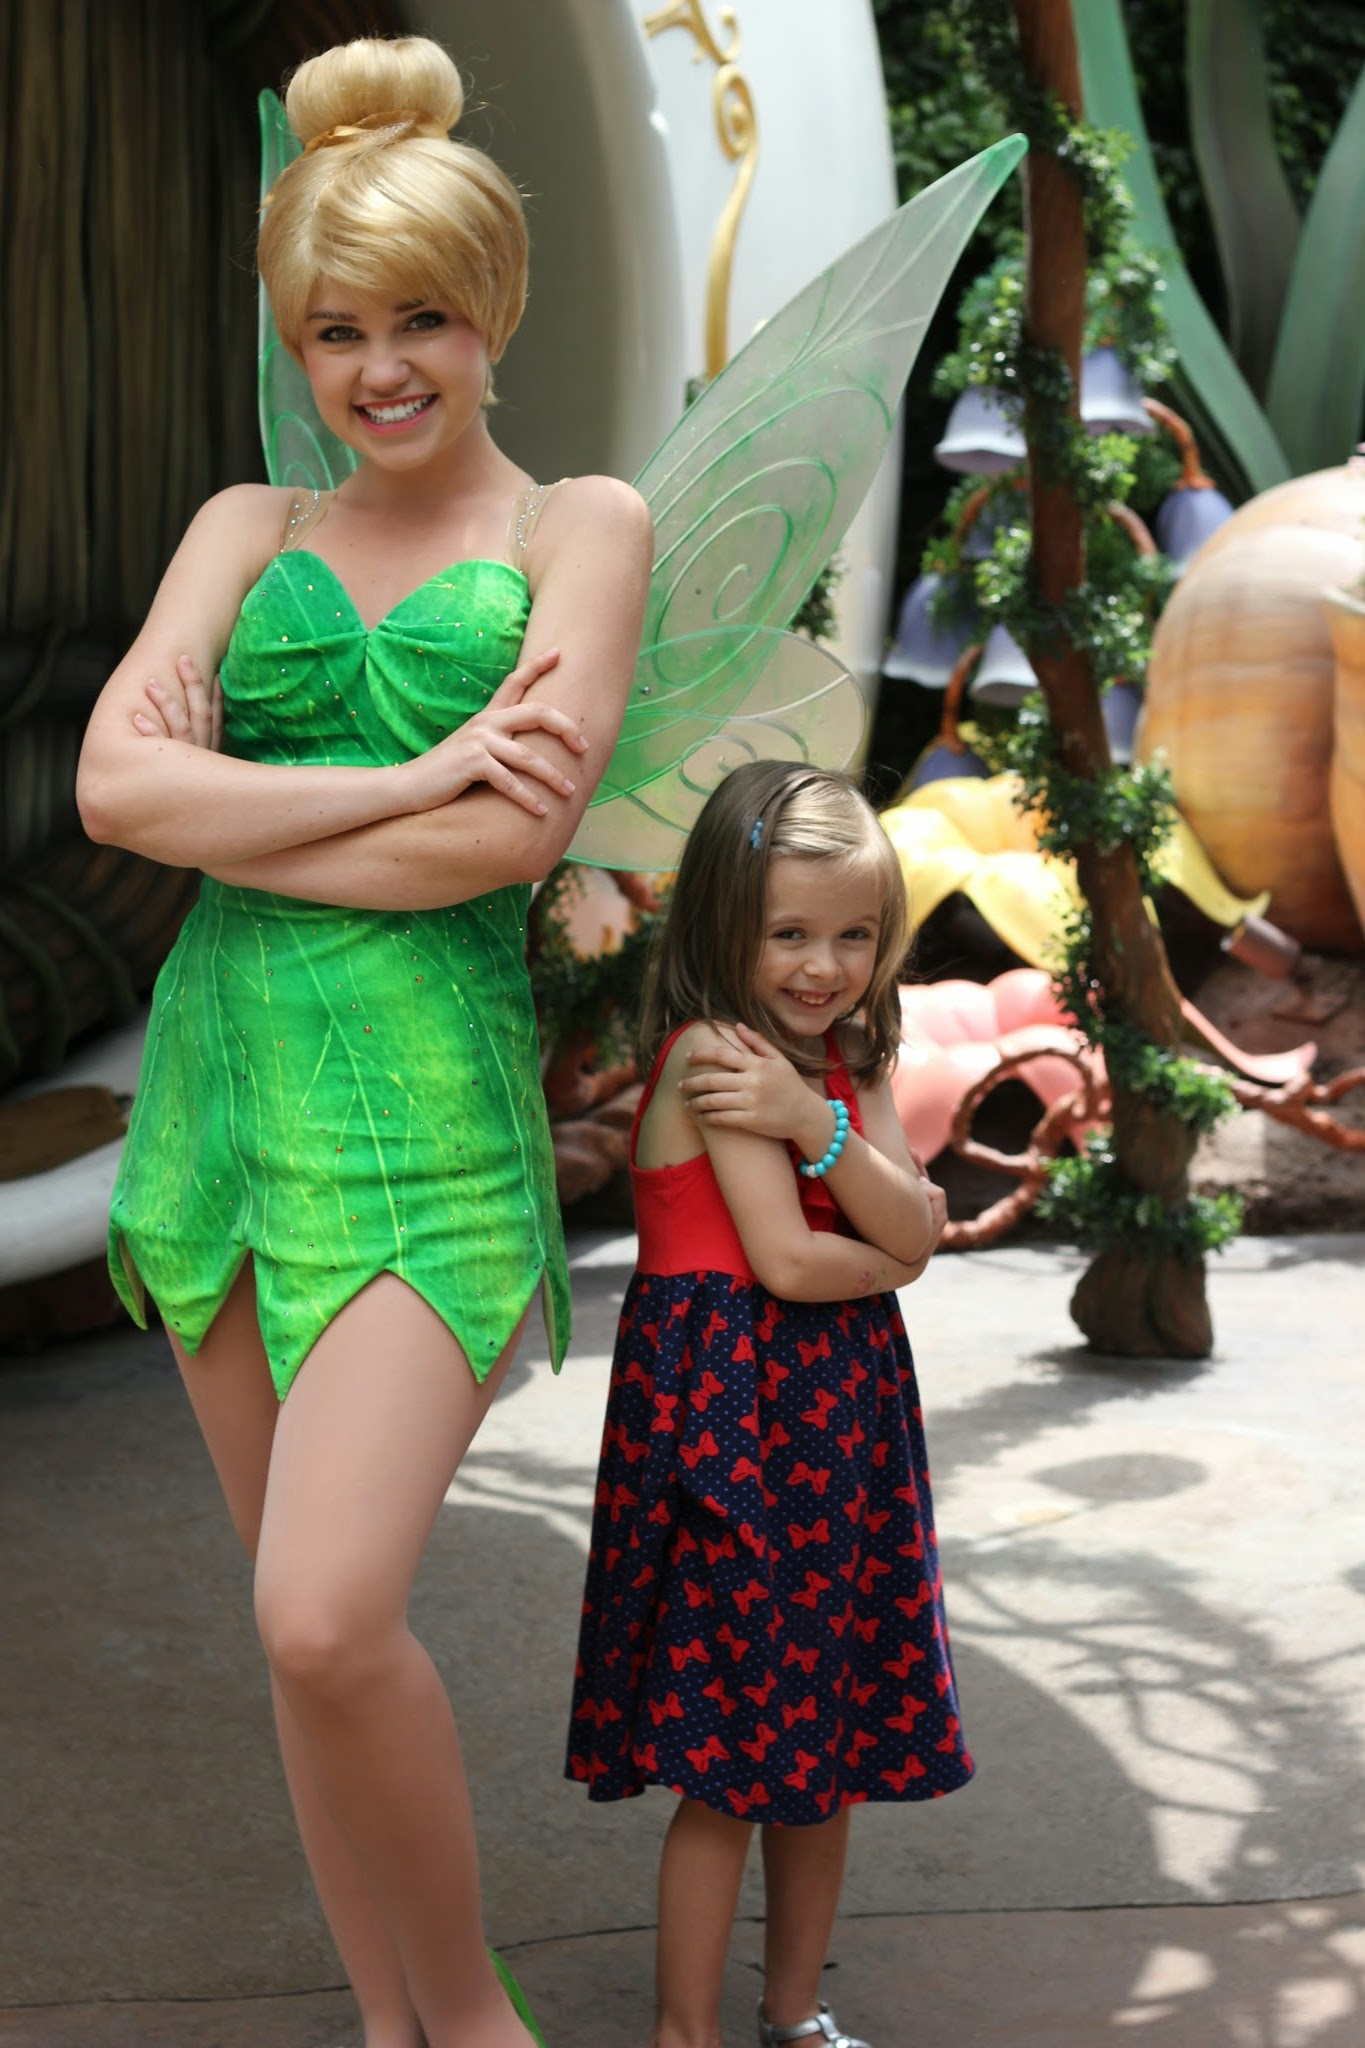 Disneyland Tinker Bell #DisneySMMoms